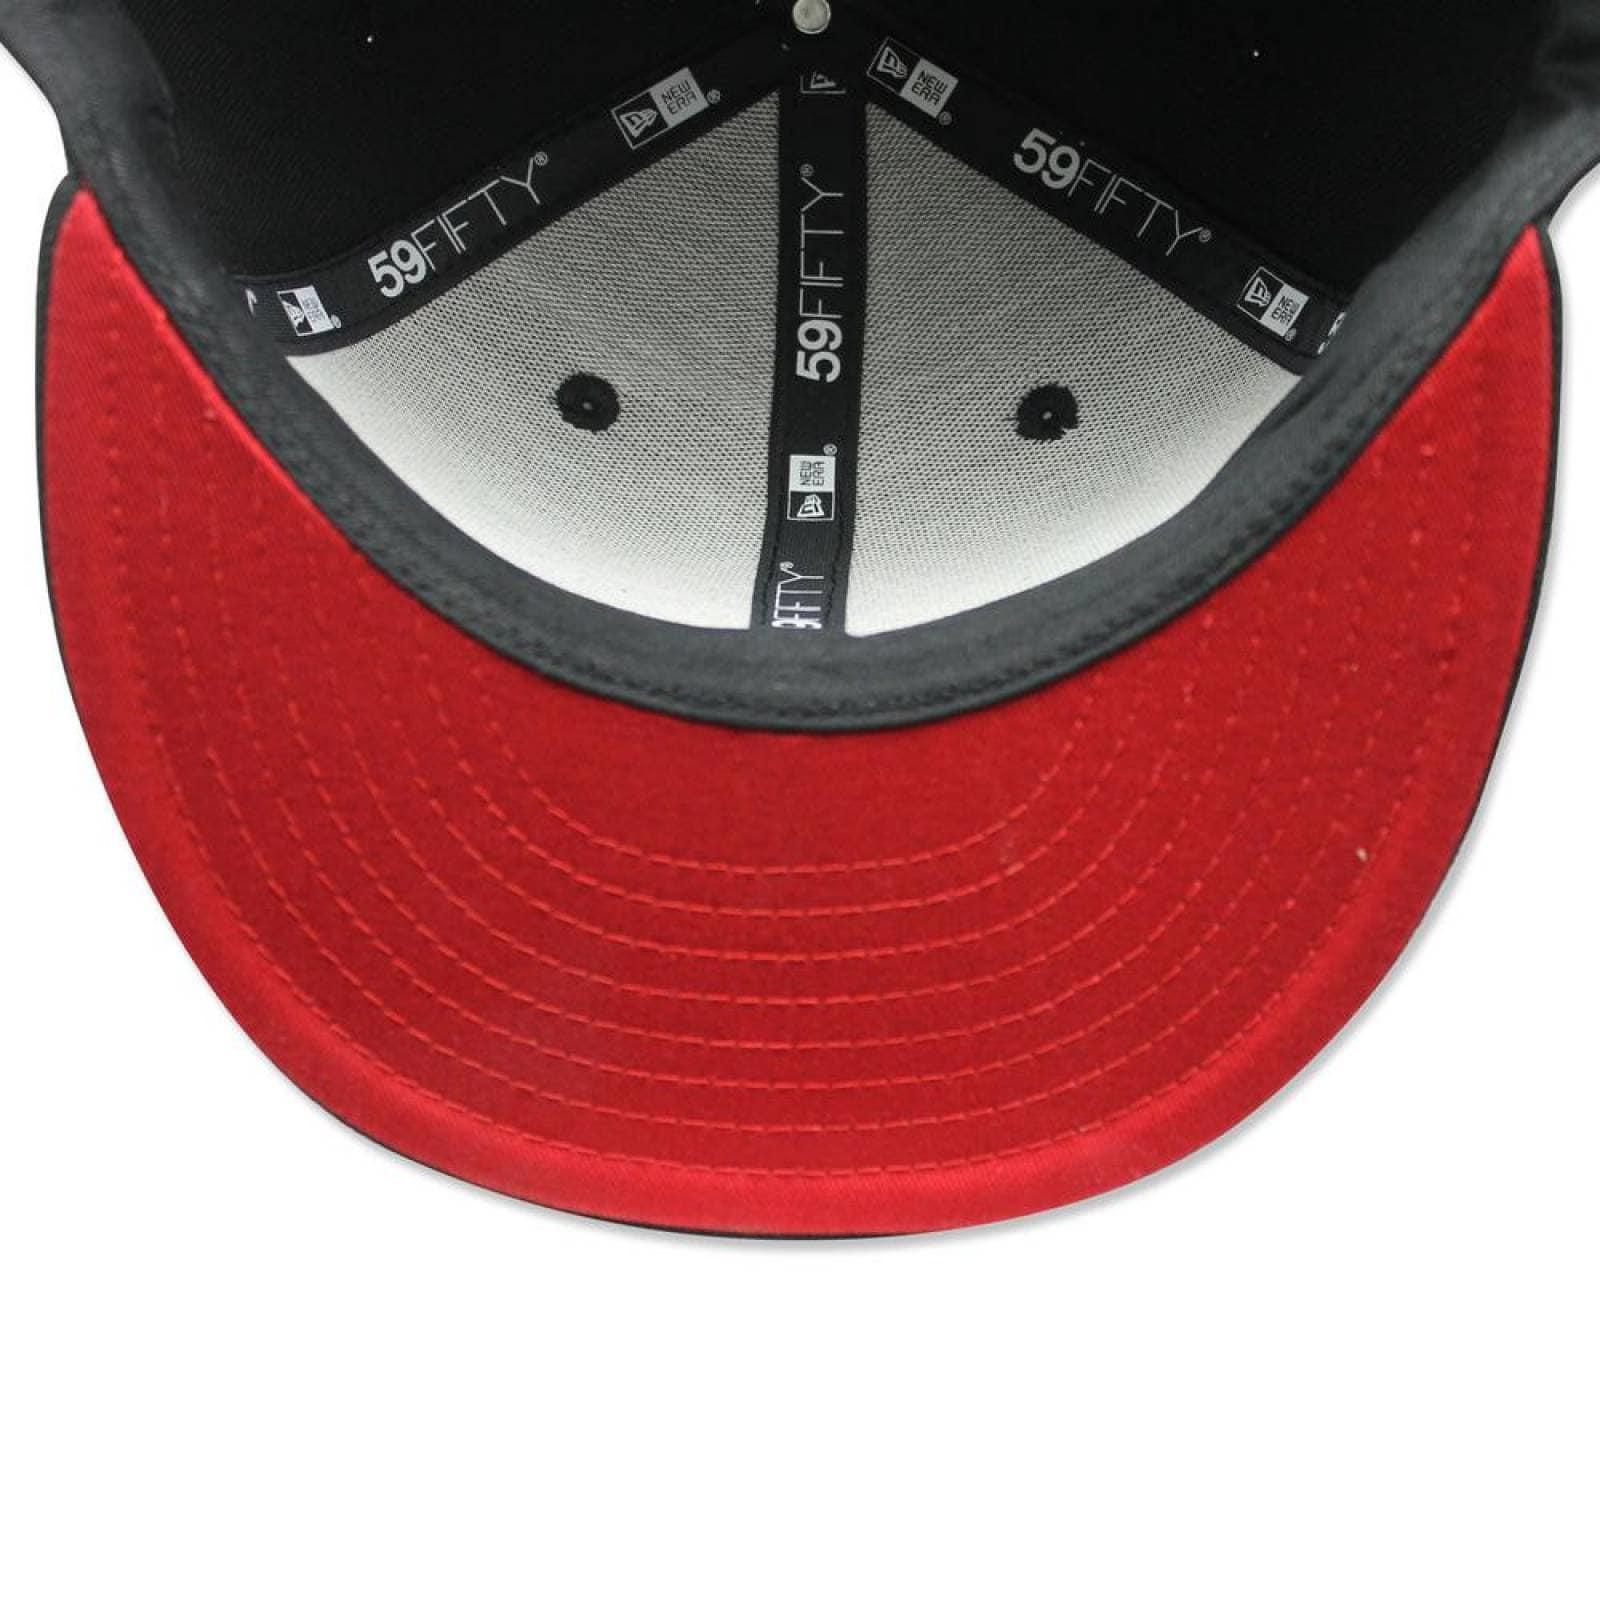 Gorra New Era 5950 LMX Xolos Letter Red Negro